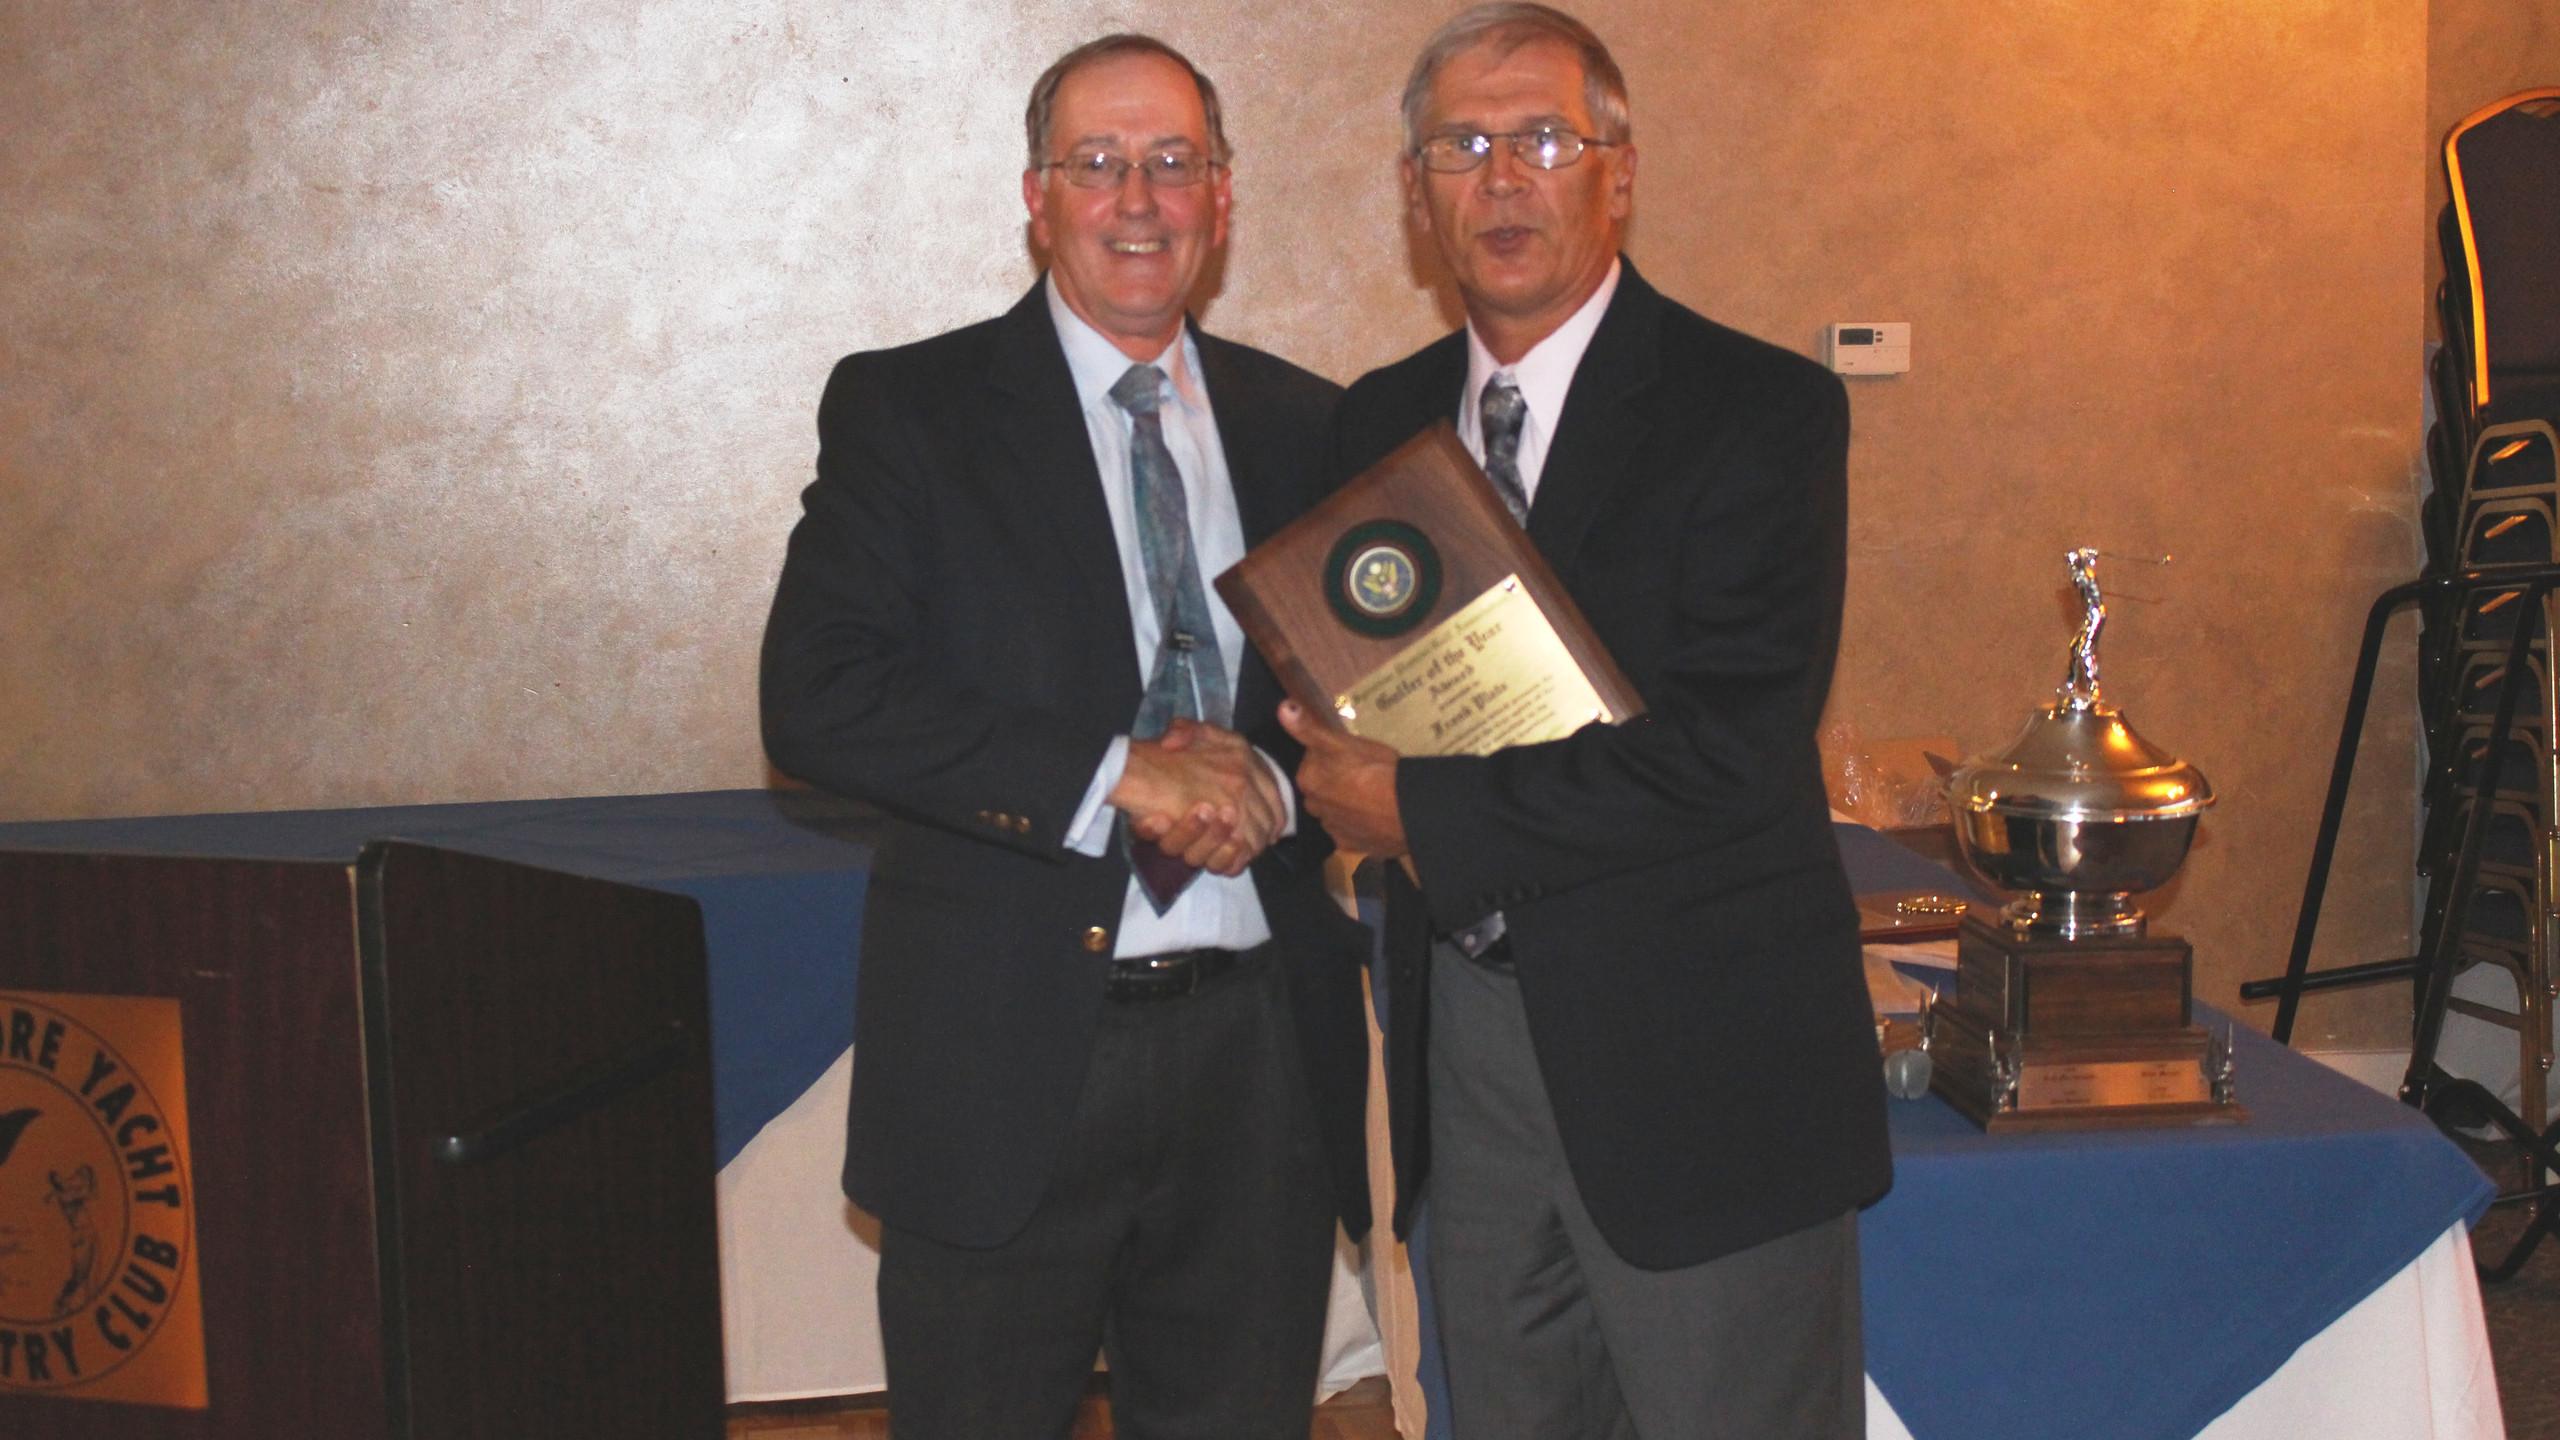 Golfer of the Year, Frank Plata with SDGA President Stew McGough